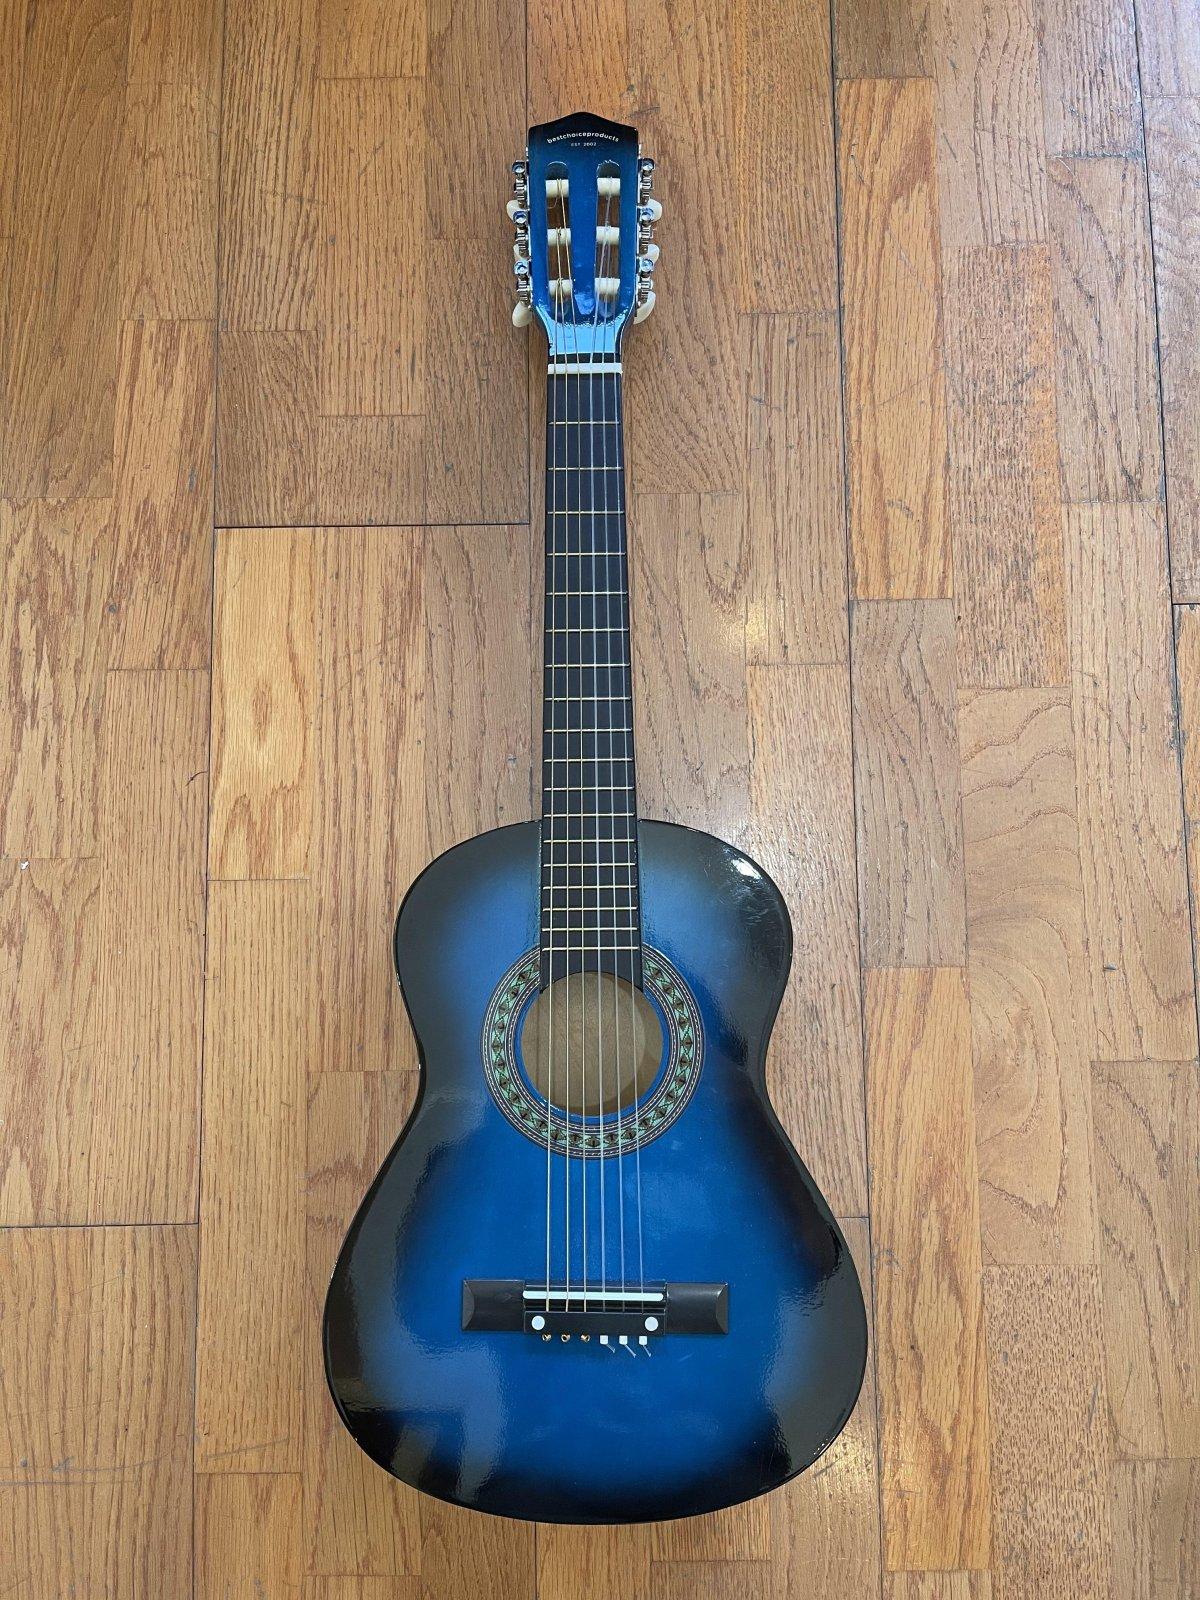 Best Choice Beginner Blue Children's Guitar